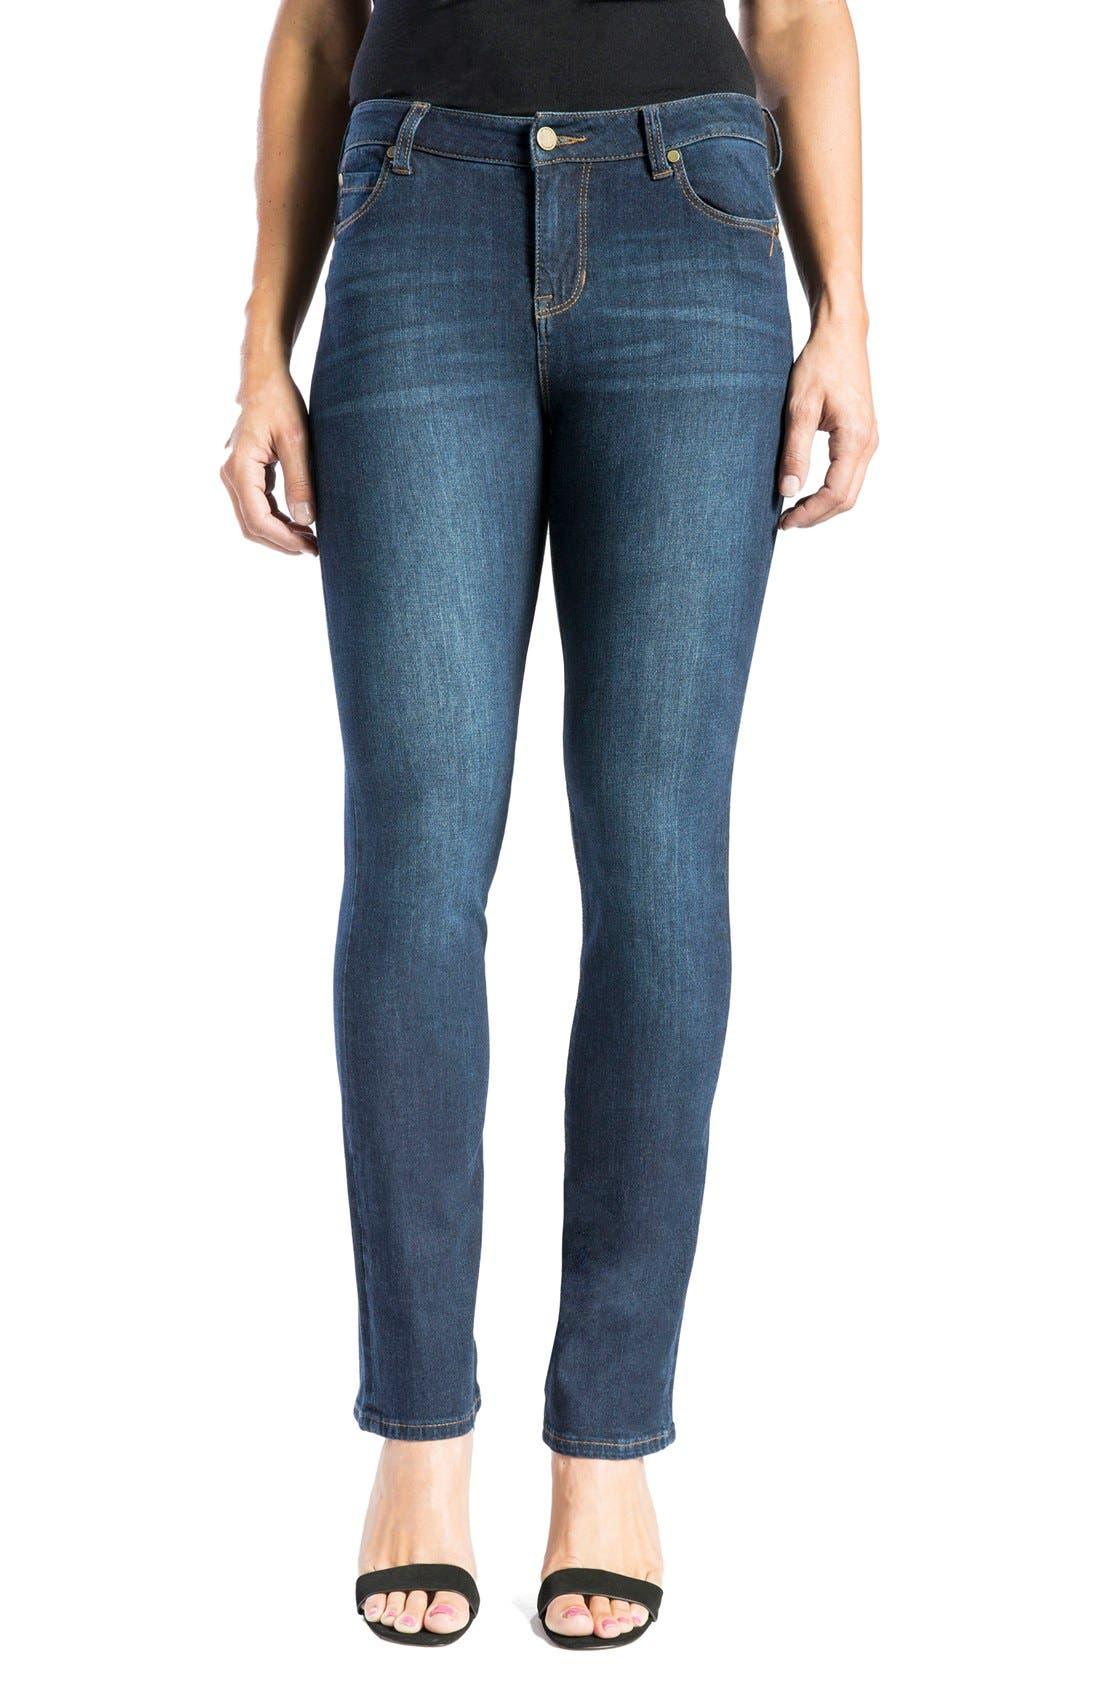 Remy - Hugger Straight Leg Jeans,                             Main thumbnail 1, color,                             401